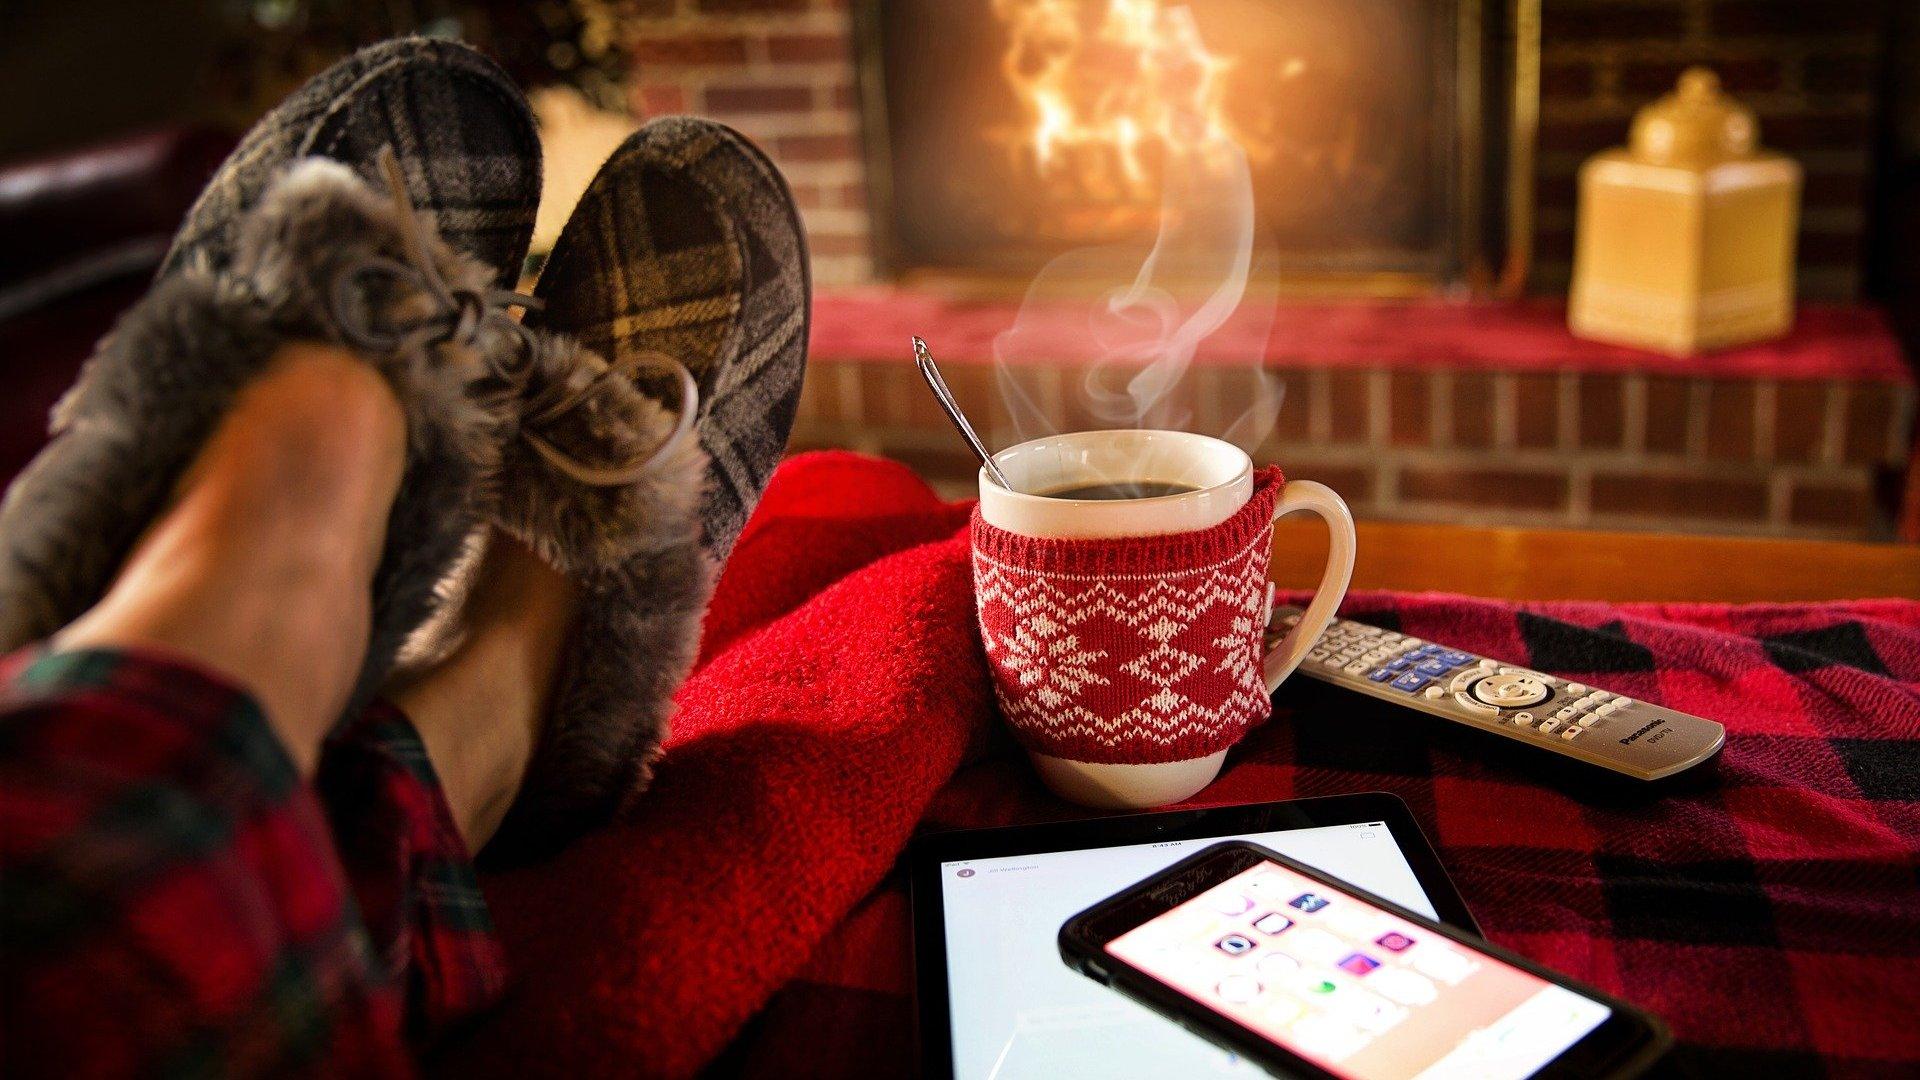 22 December - Stressjulekalenderen